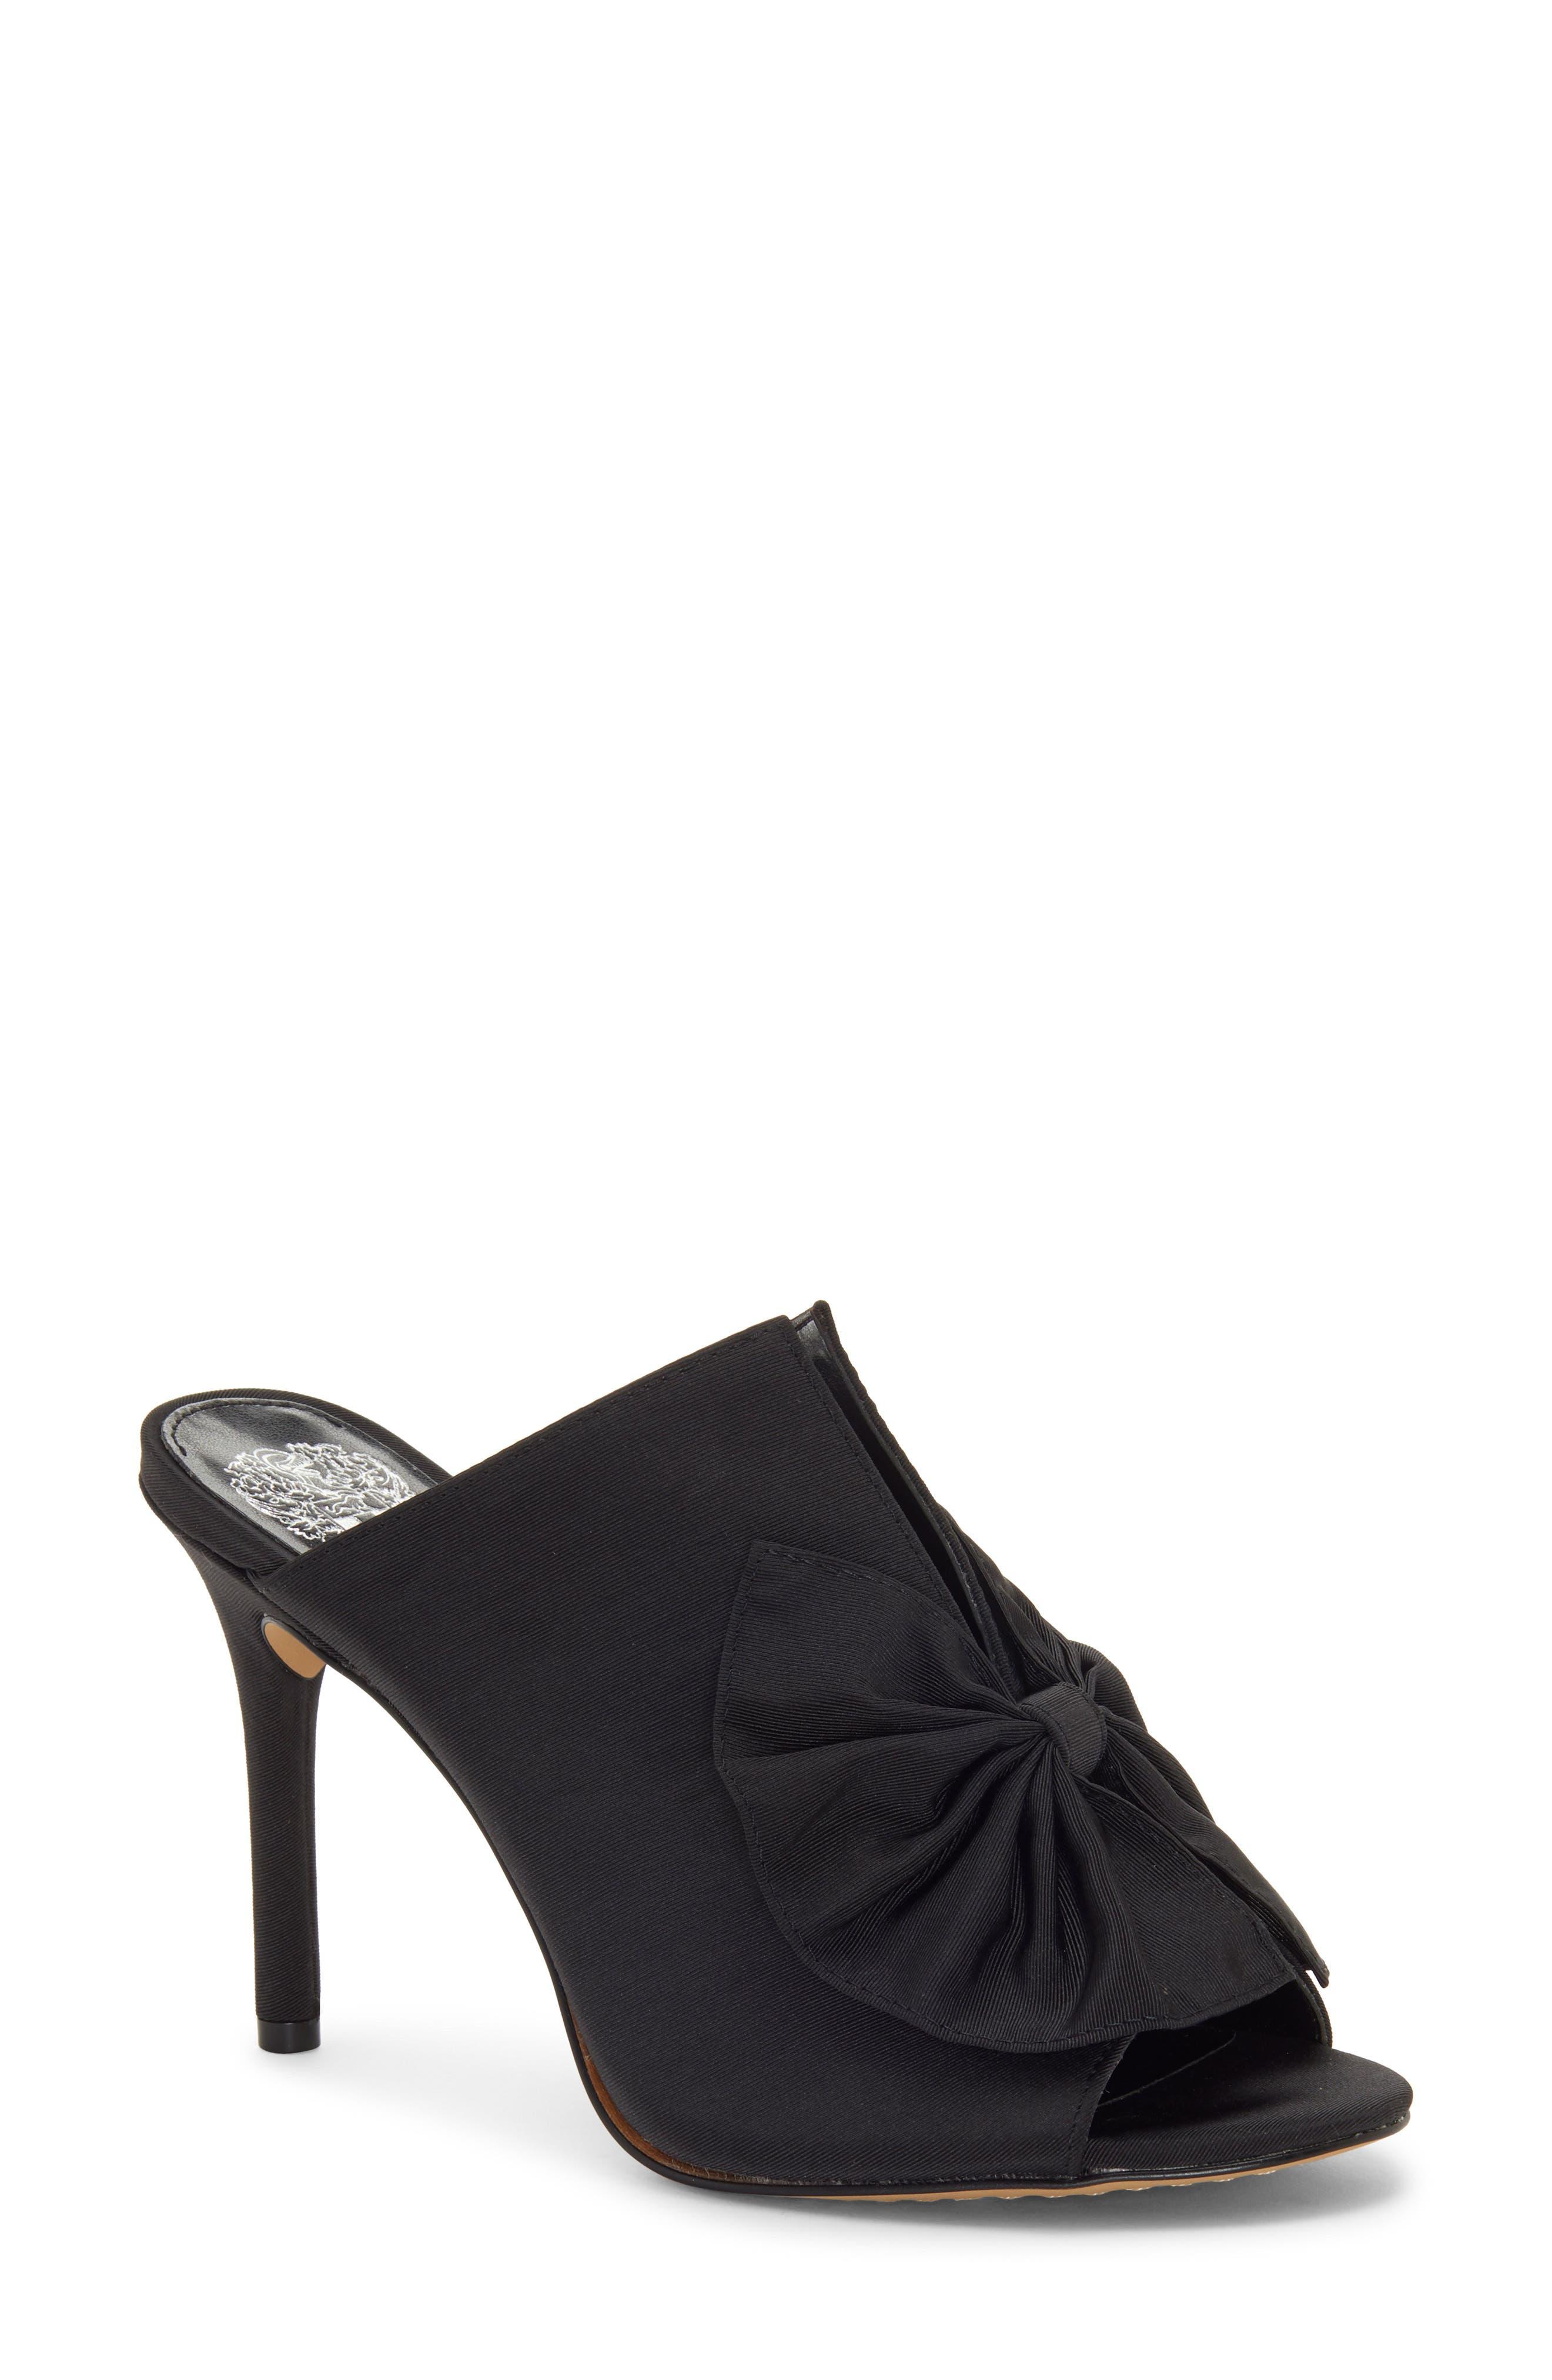 VINCE CAMUTO Cachita Sandal, Main, color, BLACK 01 FABRIC